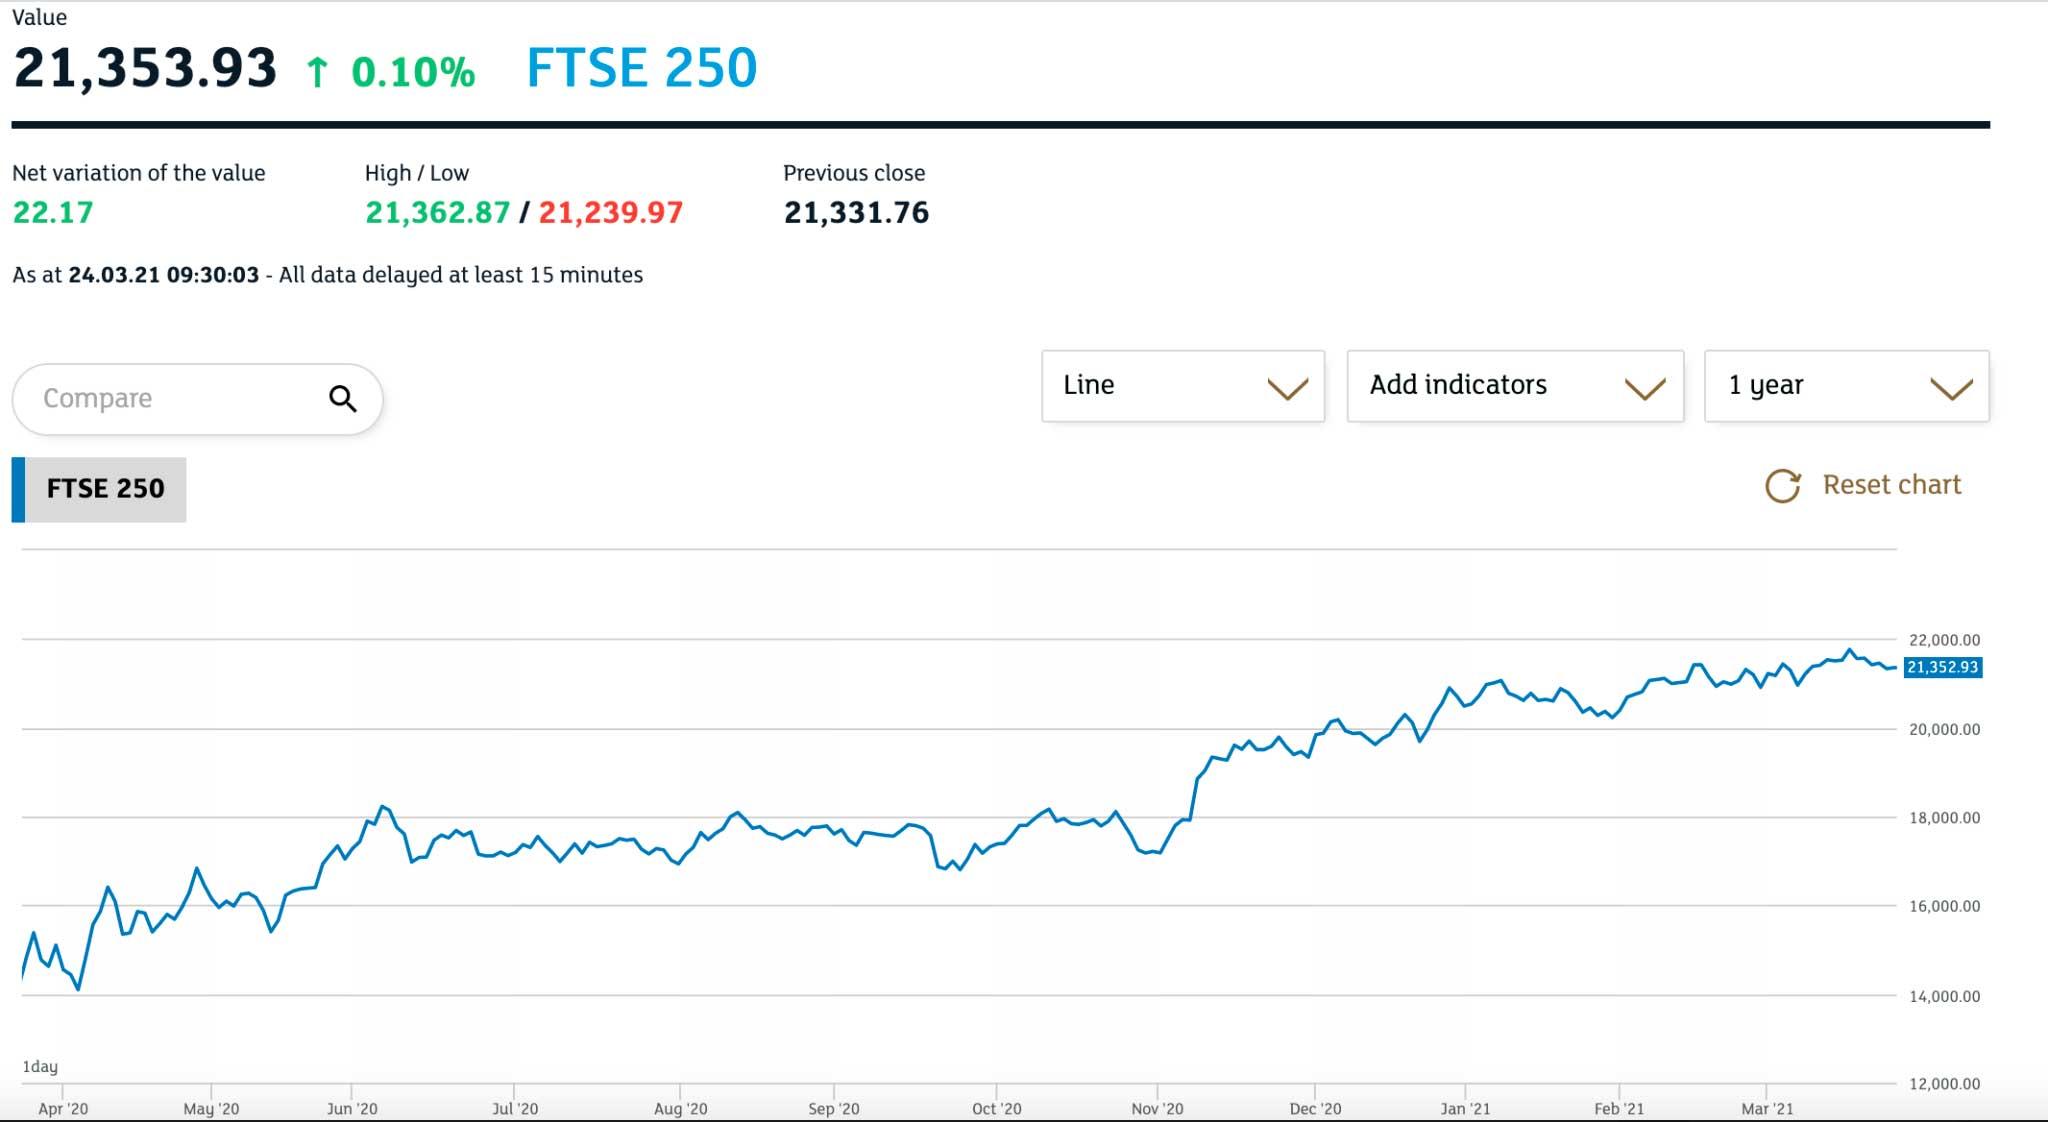 ftse 250 price chart